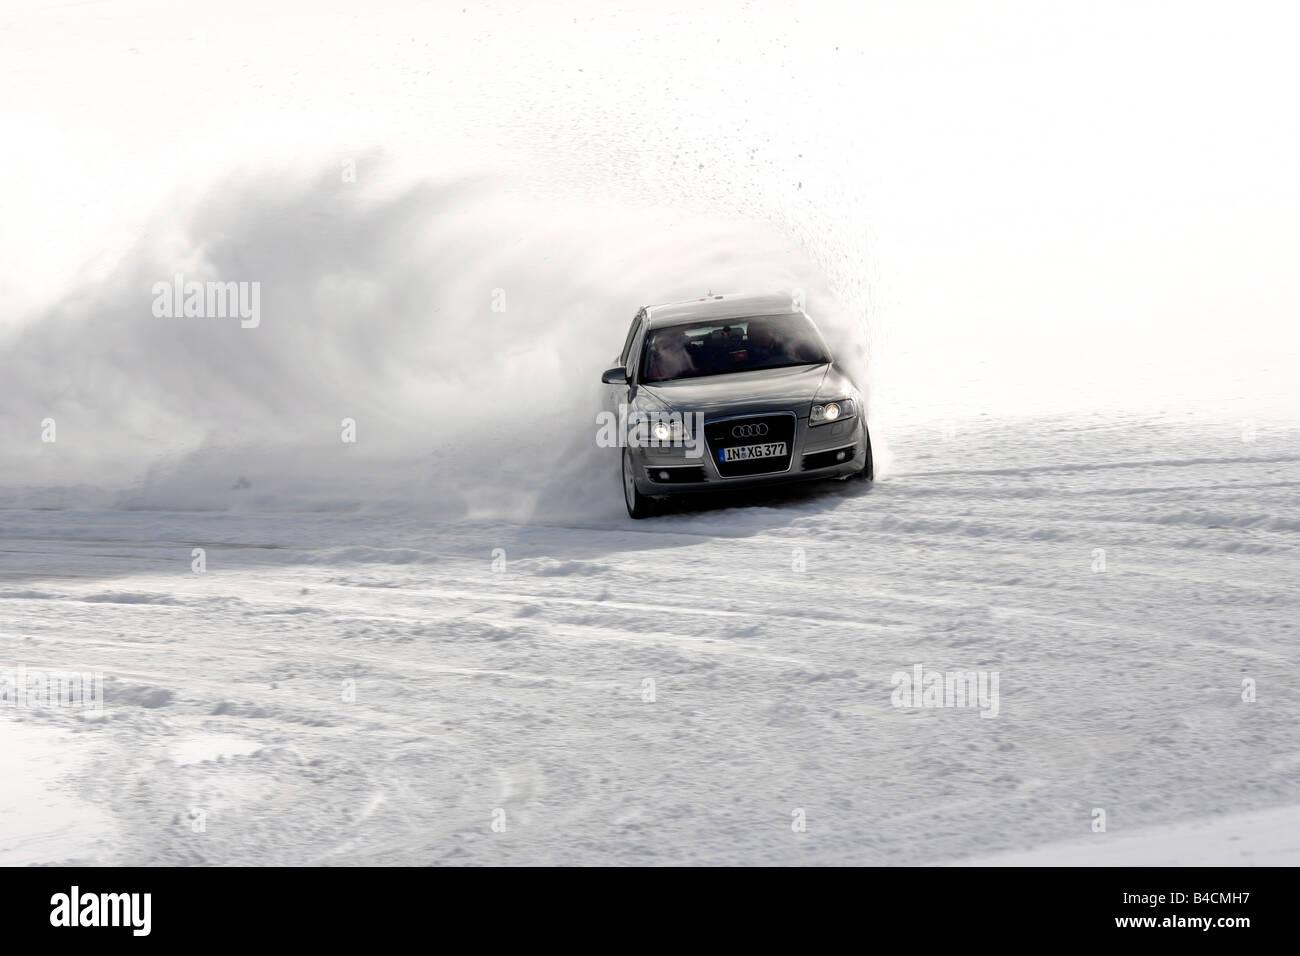 Audi A6 Avant 32 Fsi Quattro Model Year 2005 Silver Driving